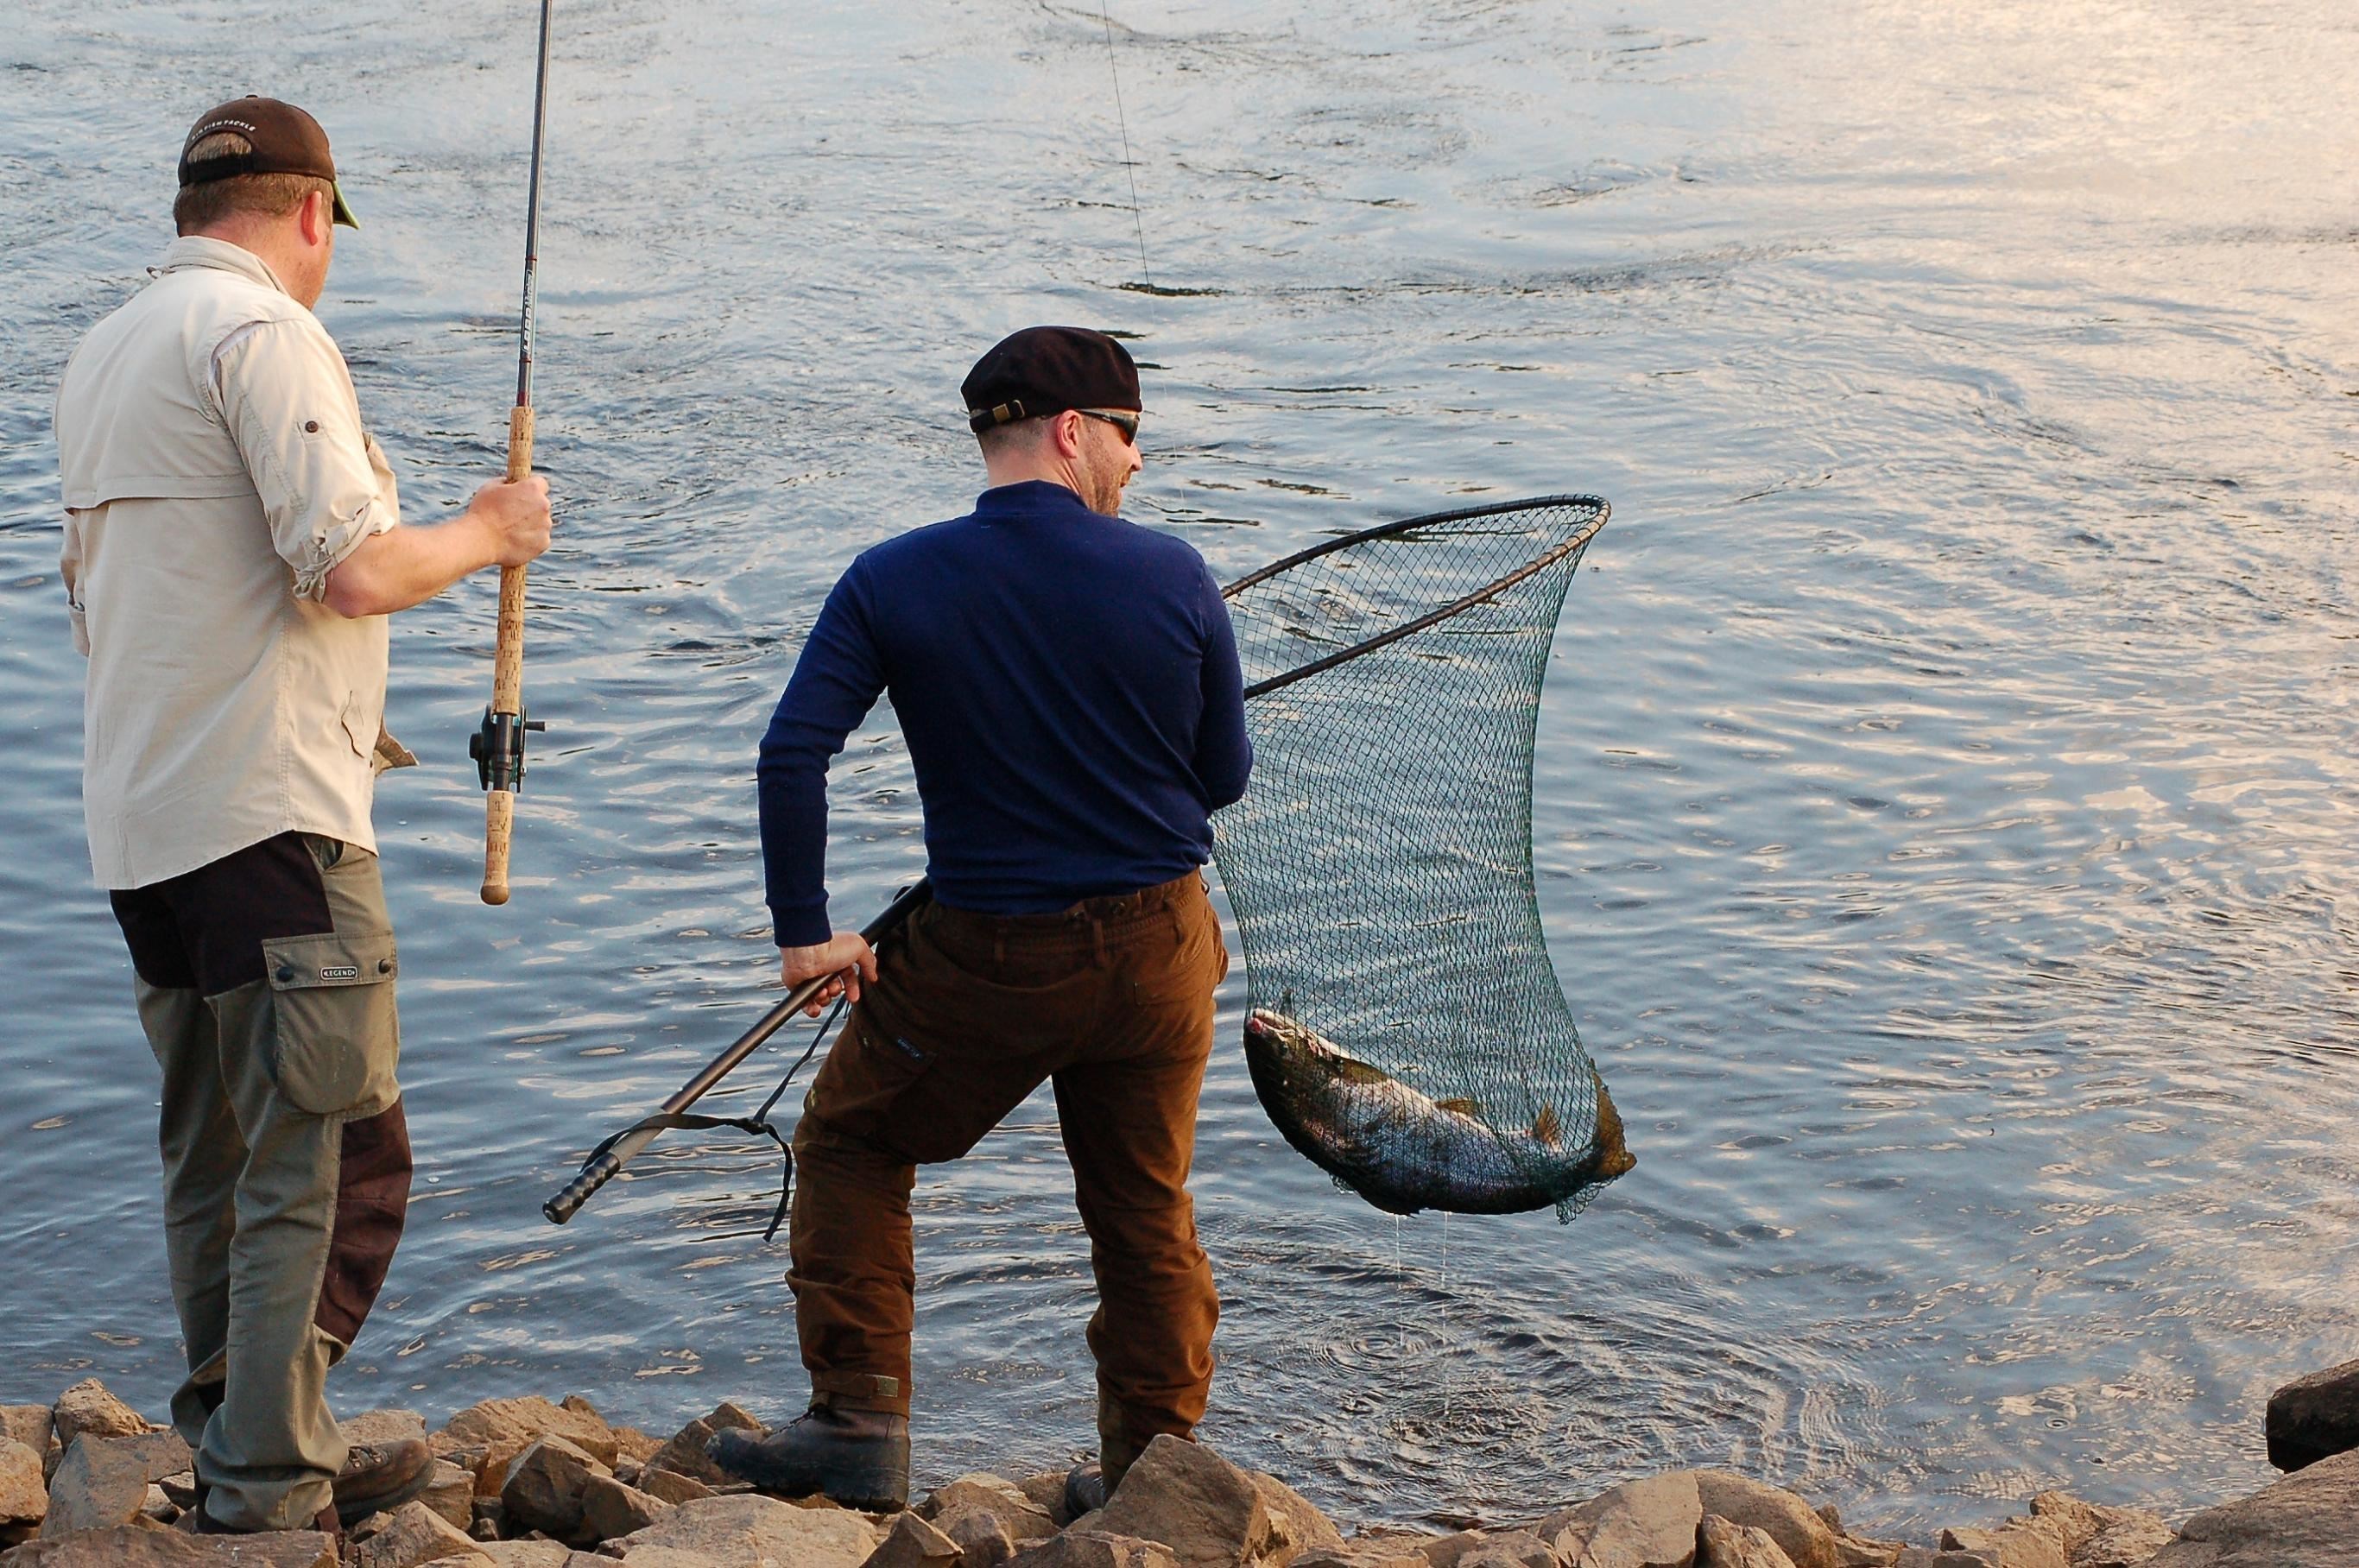 Foto: Media Lupus, Lax i håv vid Nipstadsfisket